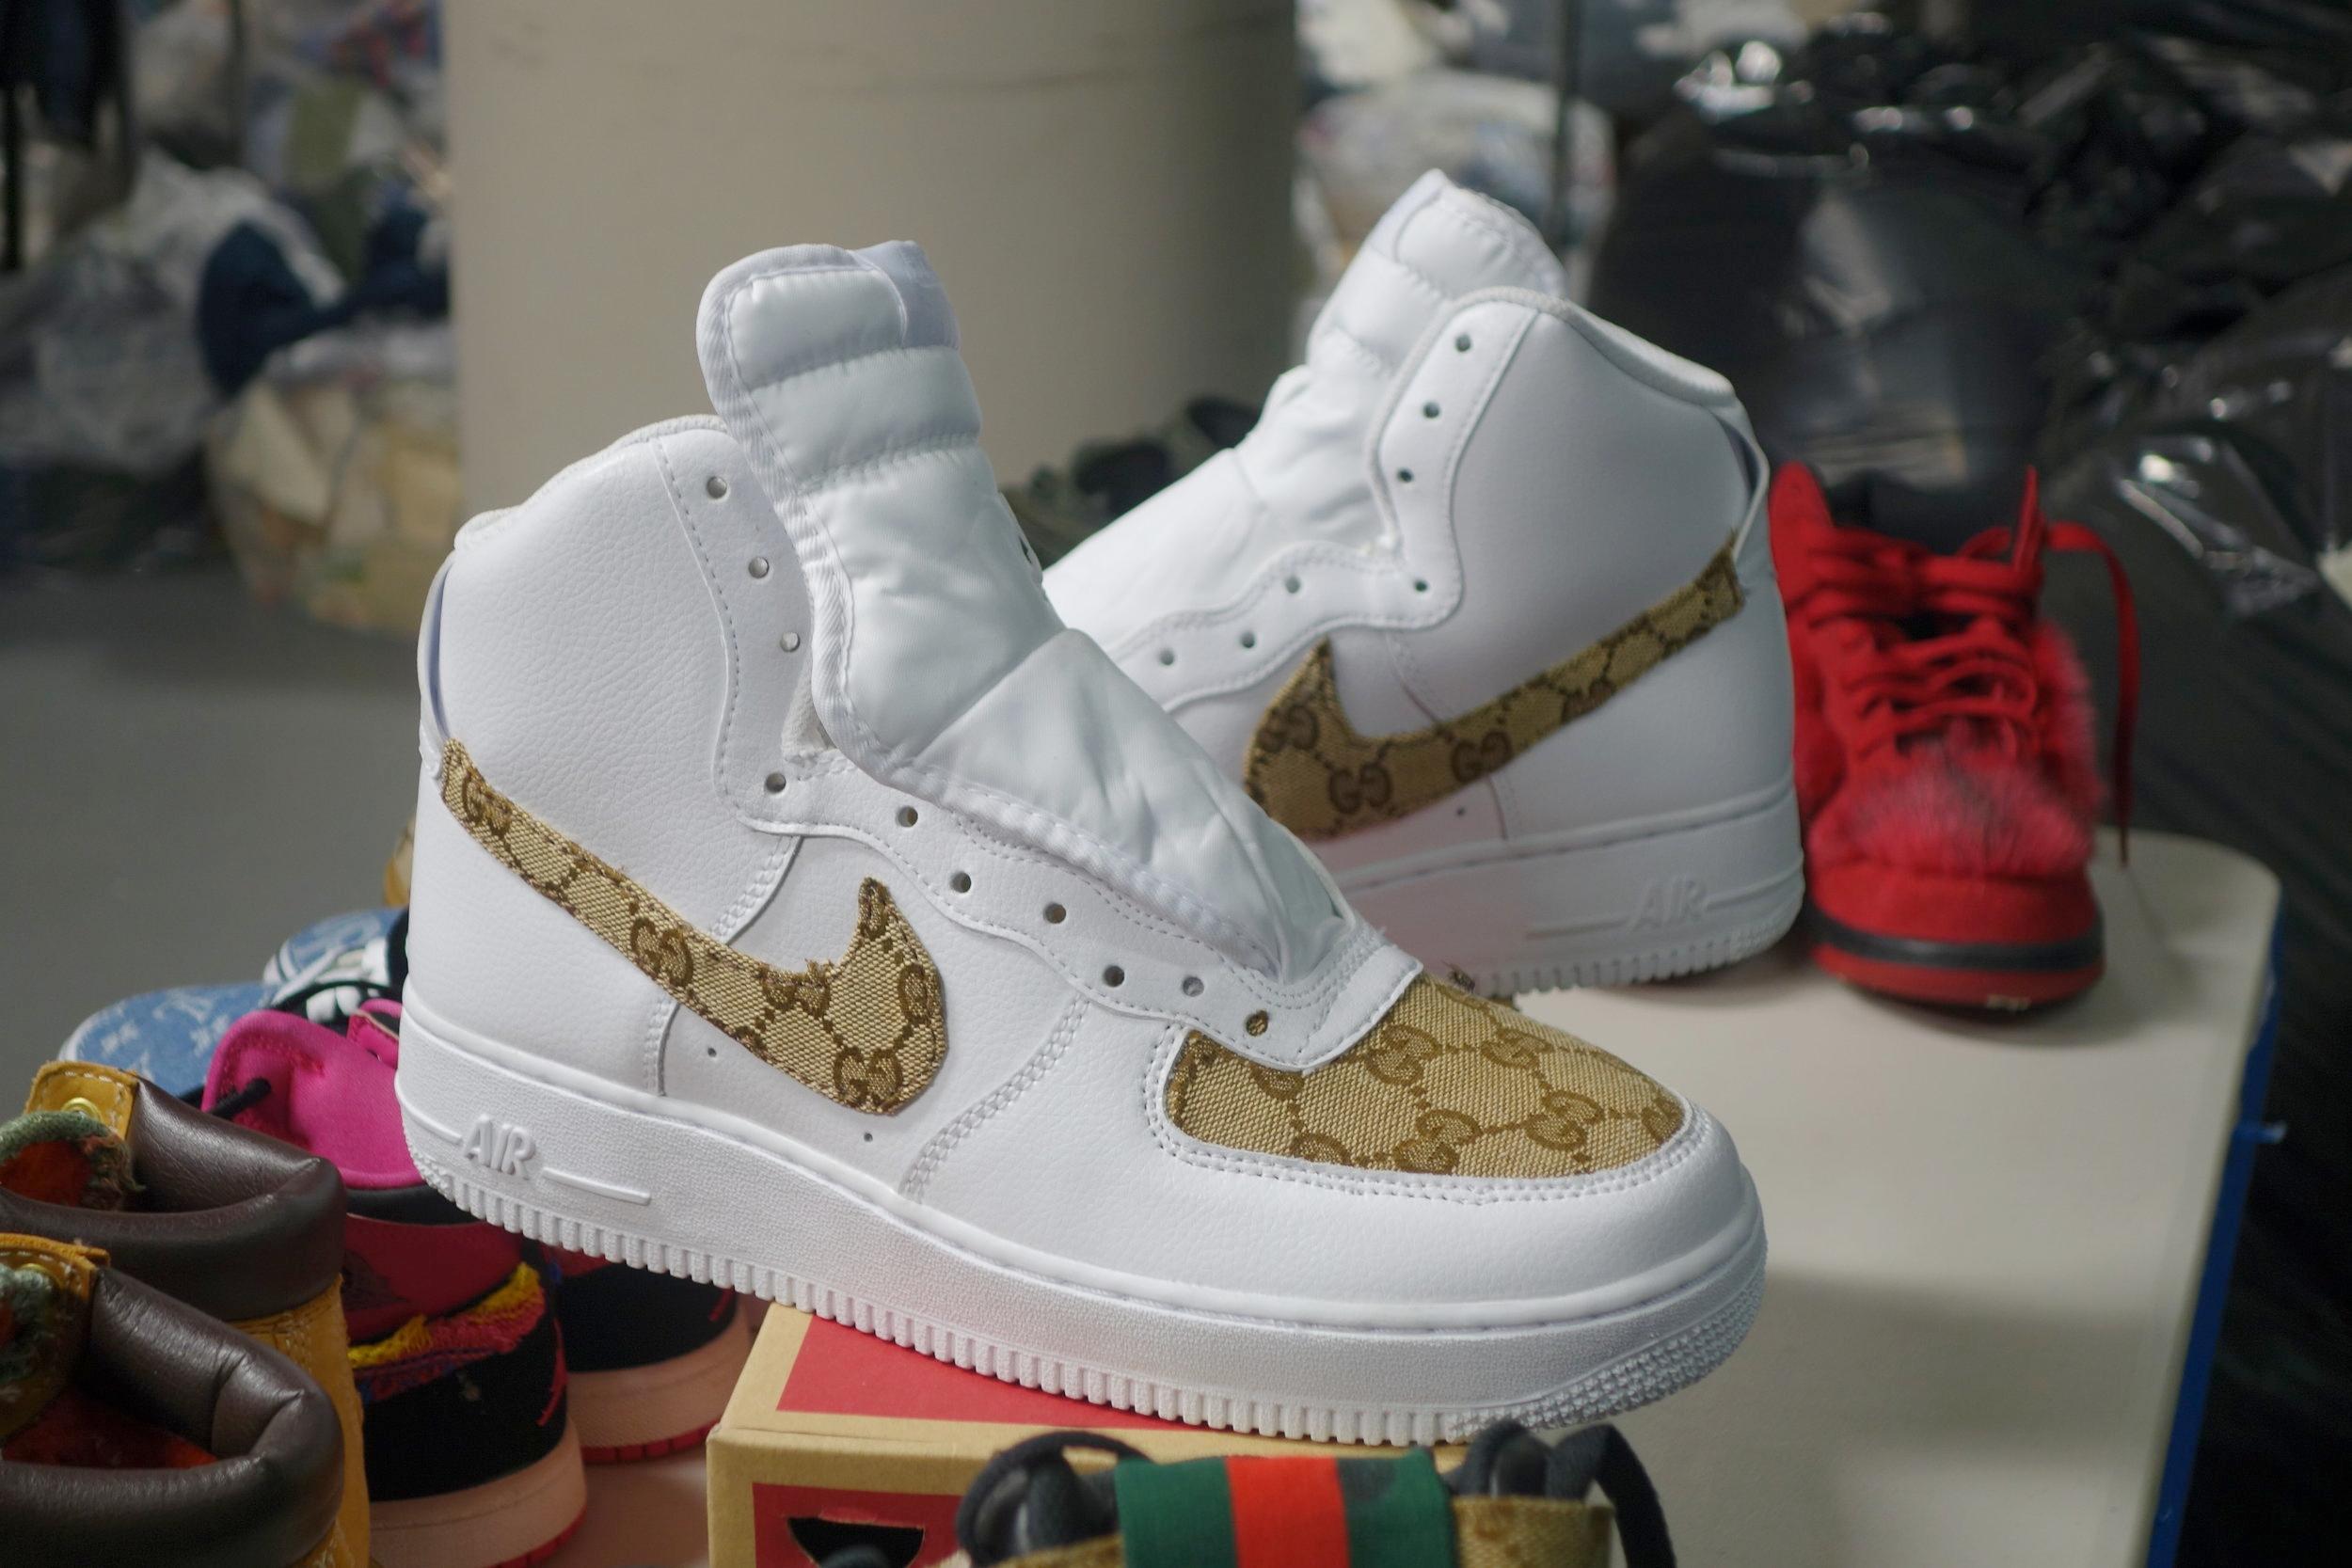 Custom made AF1 sneakers by Royal Vision.